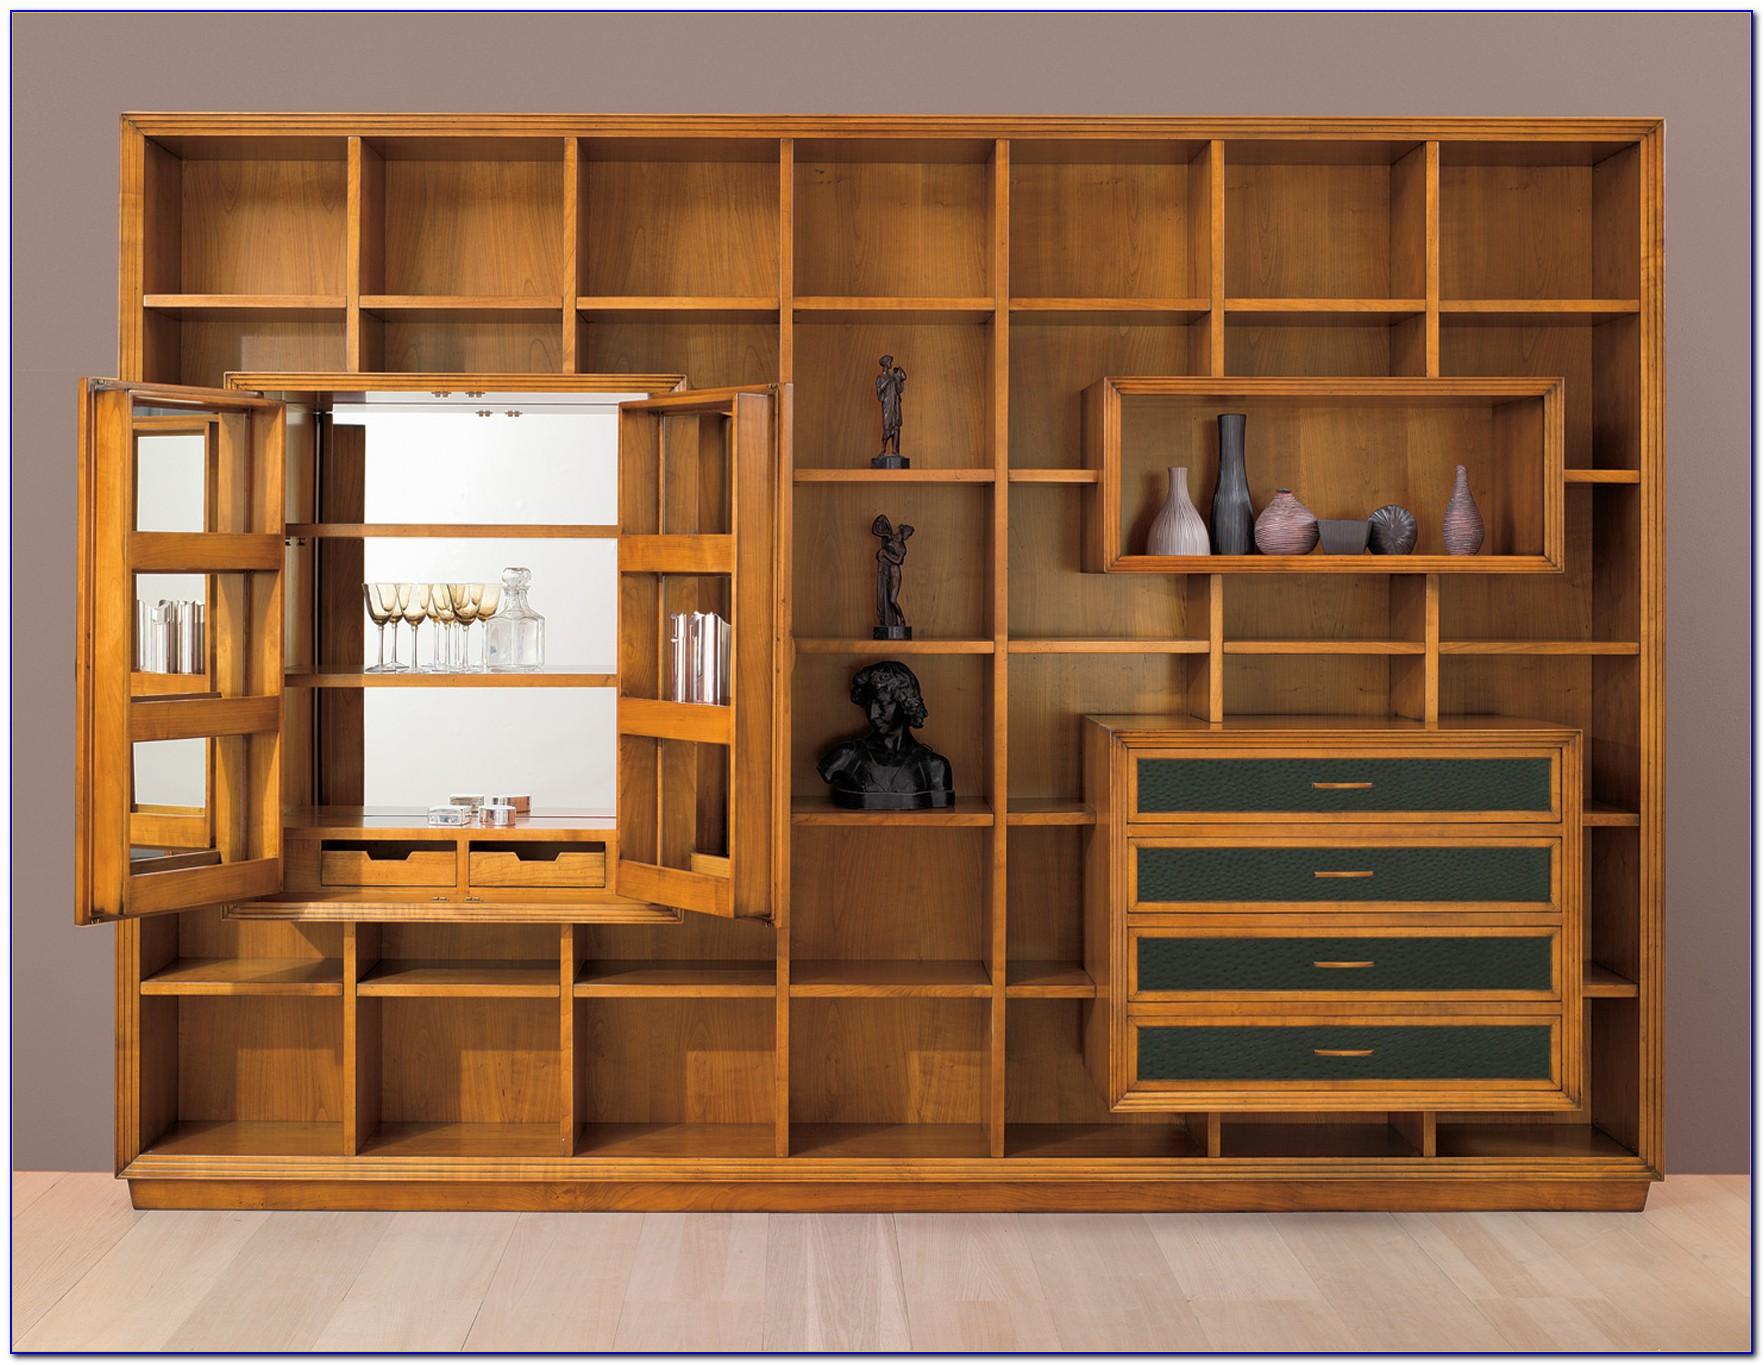 Bookshelf Wall Units